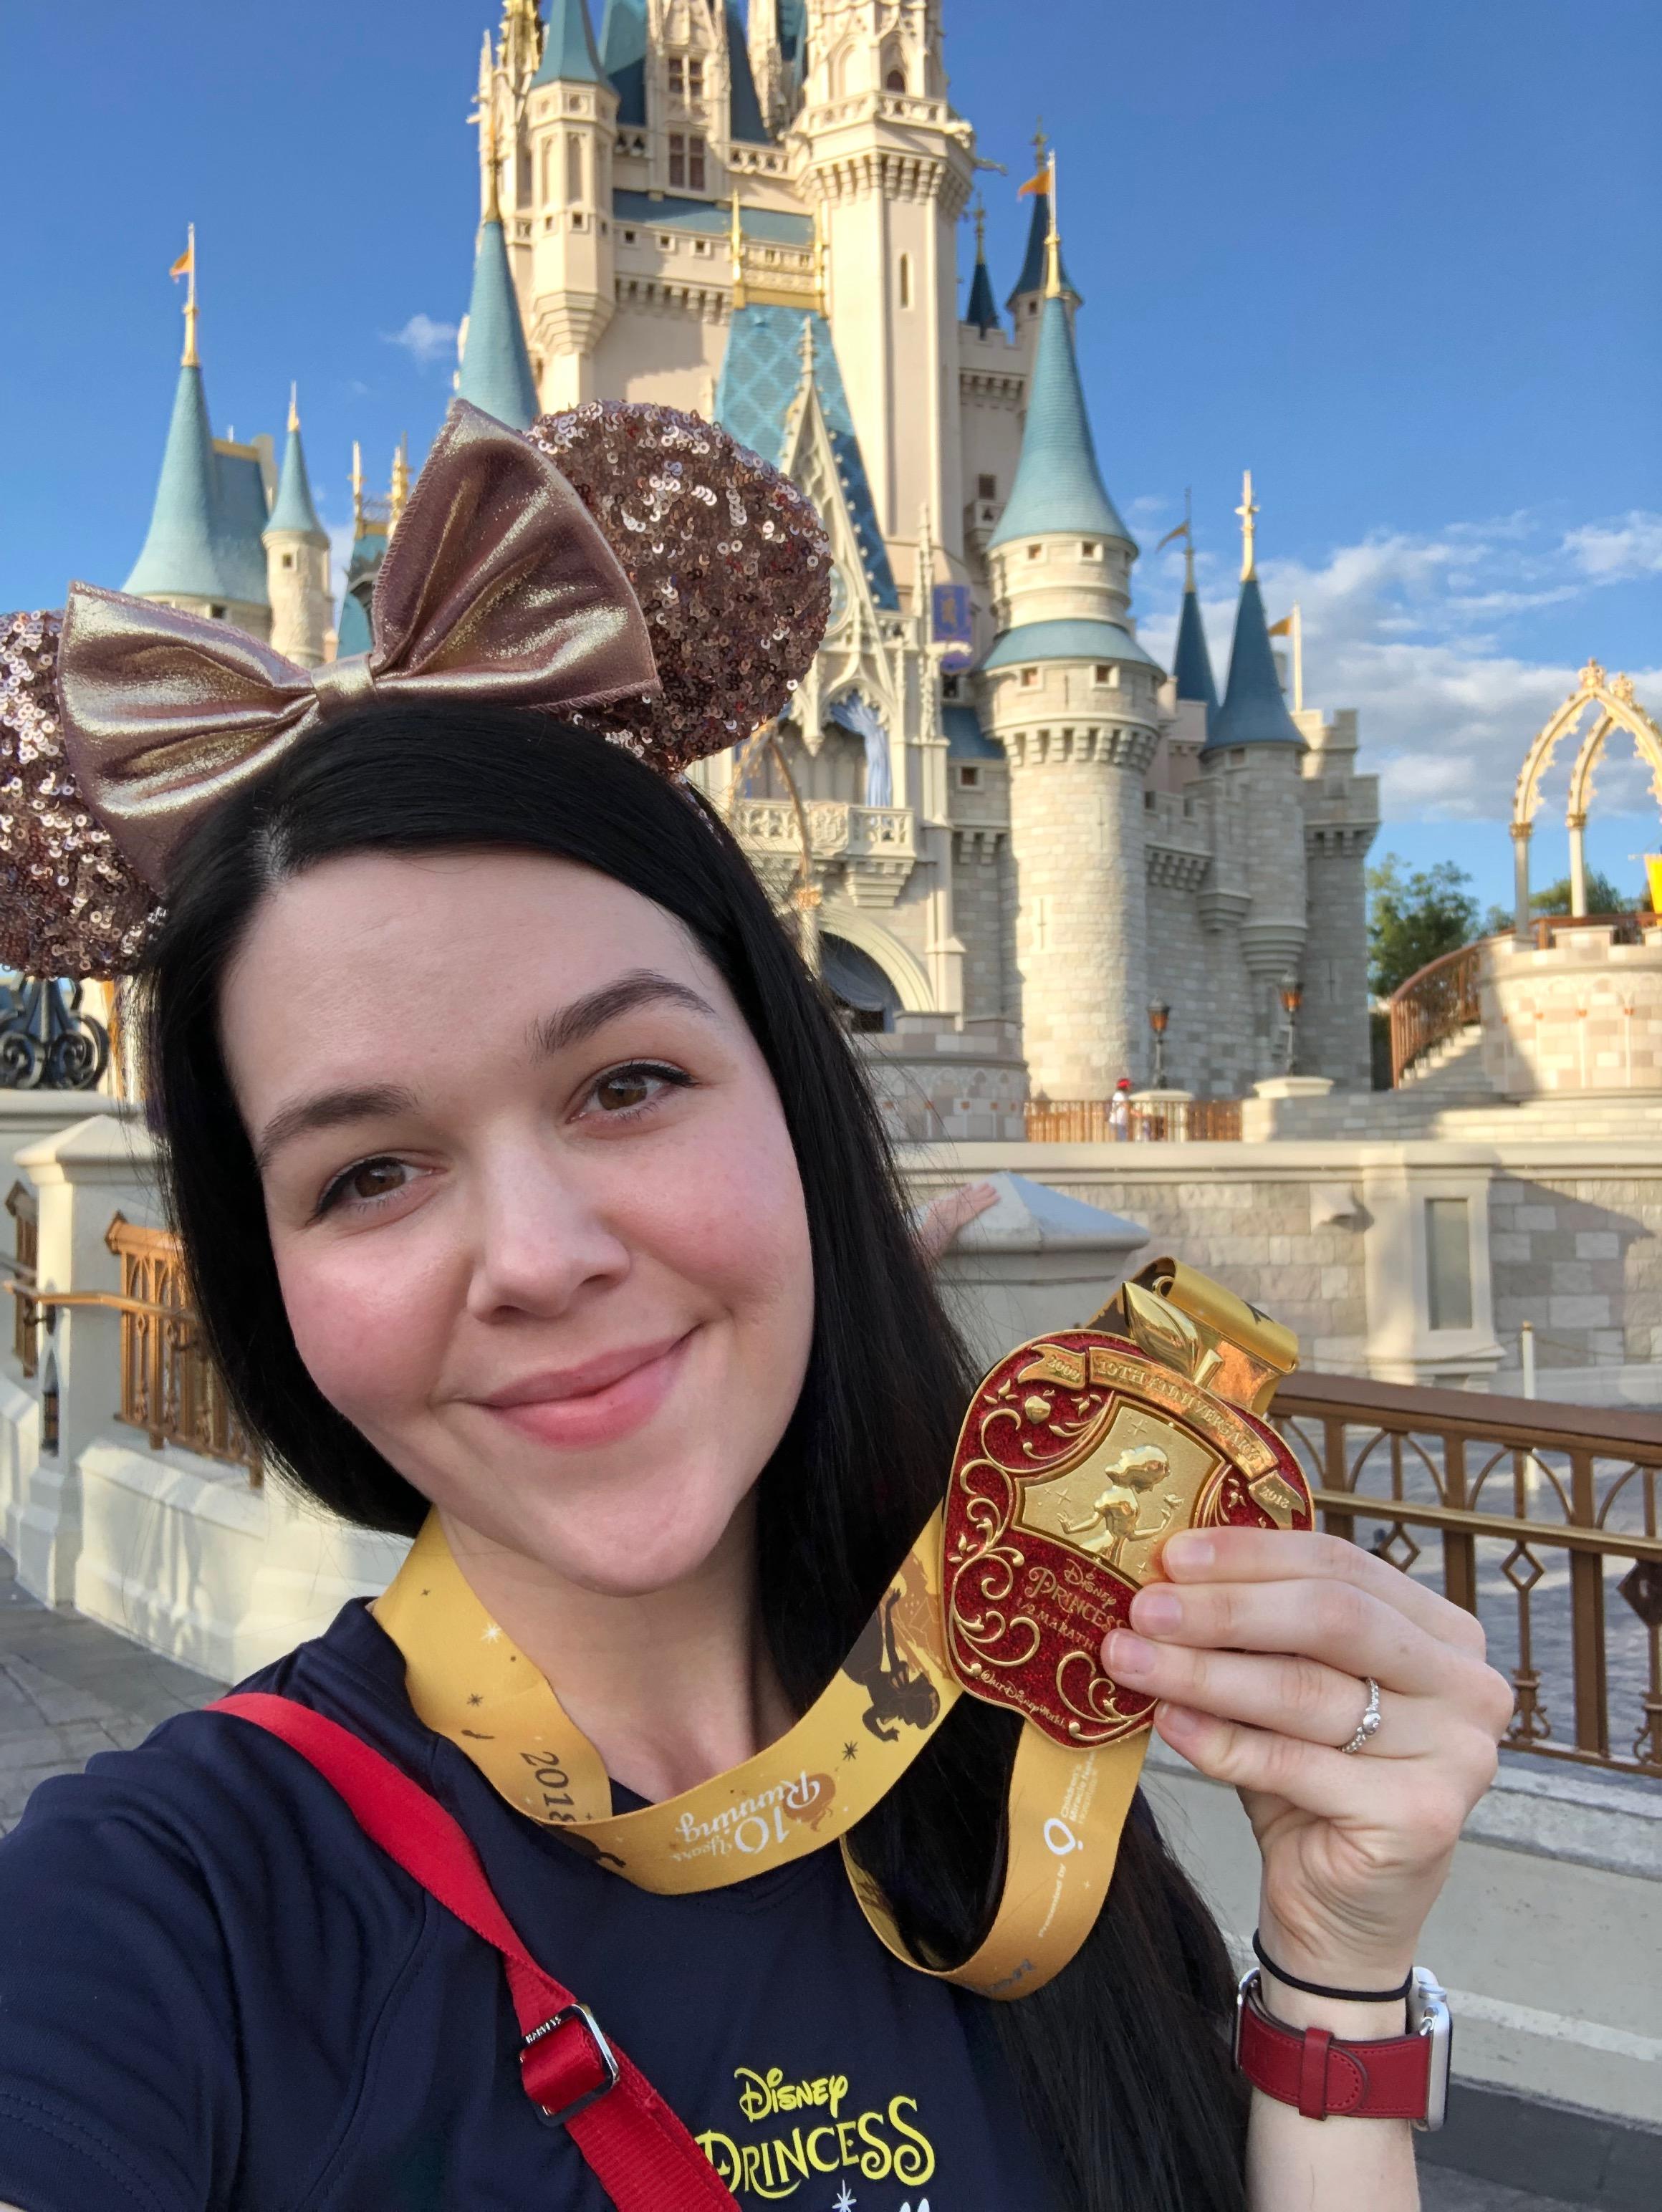 2018 Princess half marathon weekend